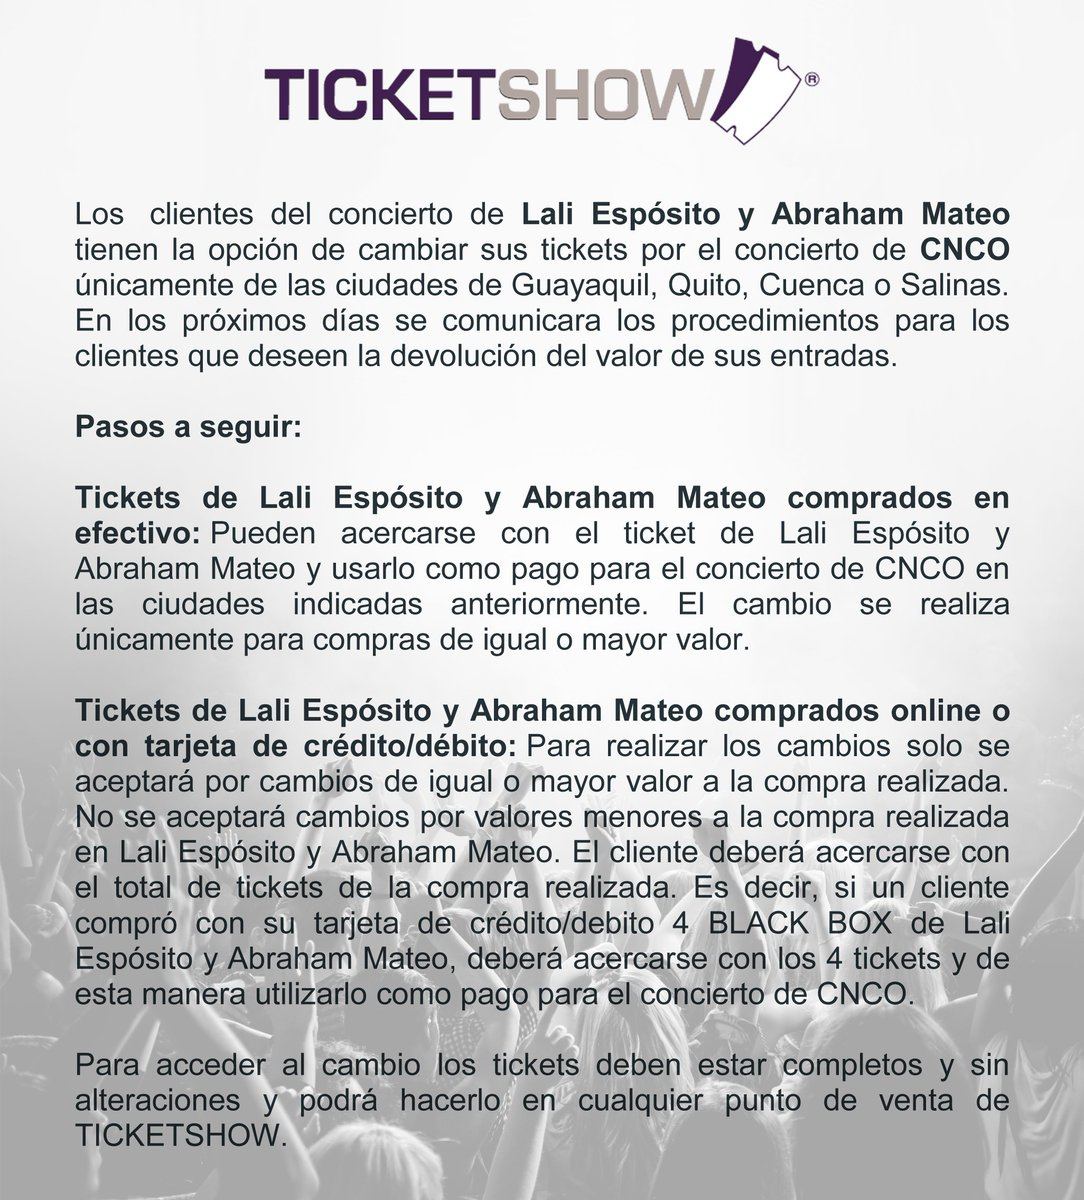 Ticket Show On Twitter Comunicado Sobre El Canje O Devolución De